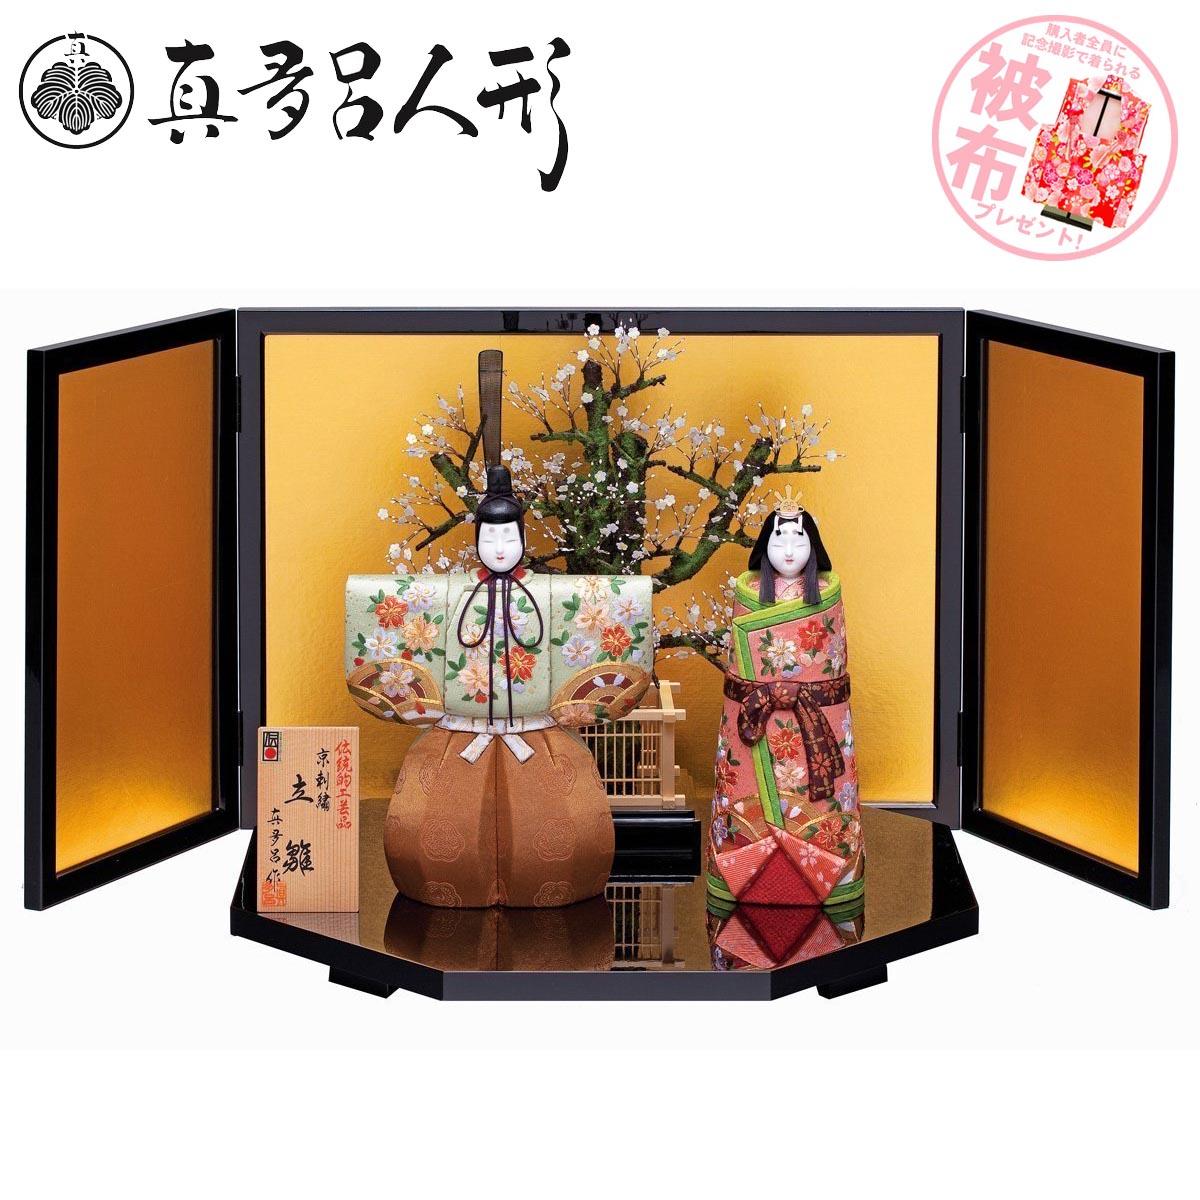 雛人形 ひな人形 雛人形 木目込み 真多呂 木製 人気 雛 光雲立雛(京刺繍)セット 人形広場